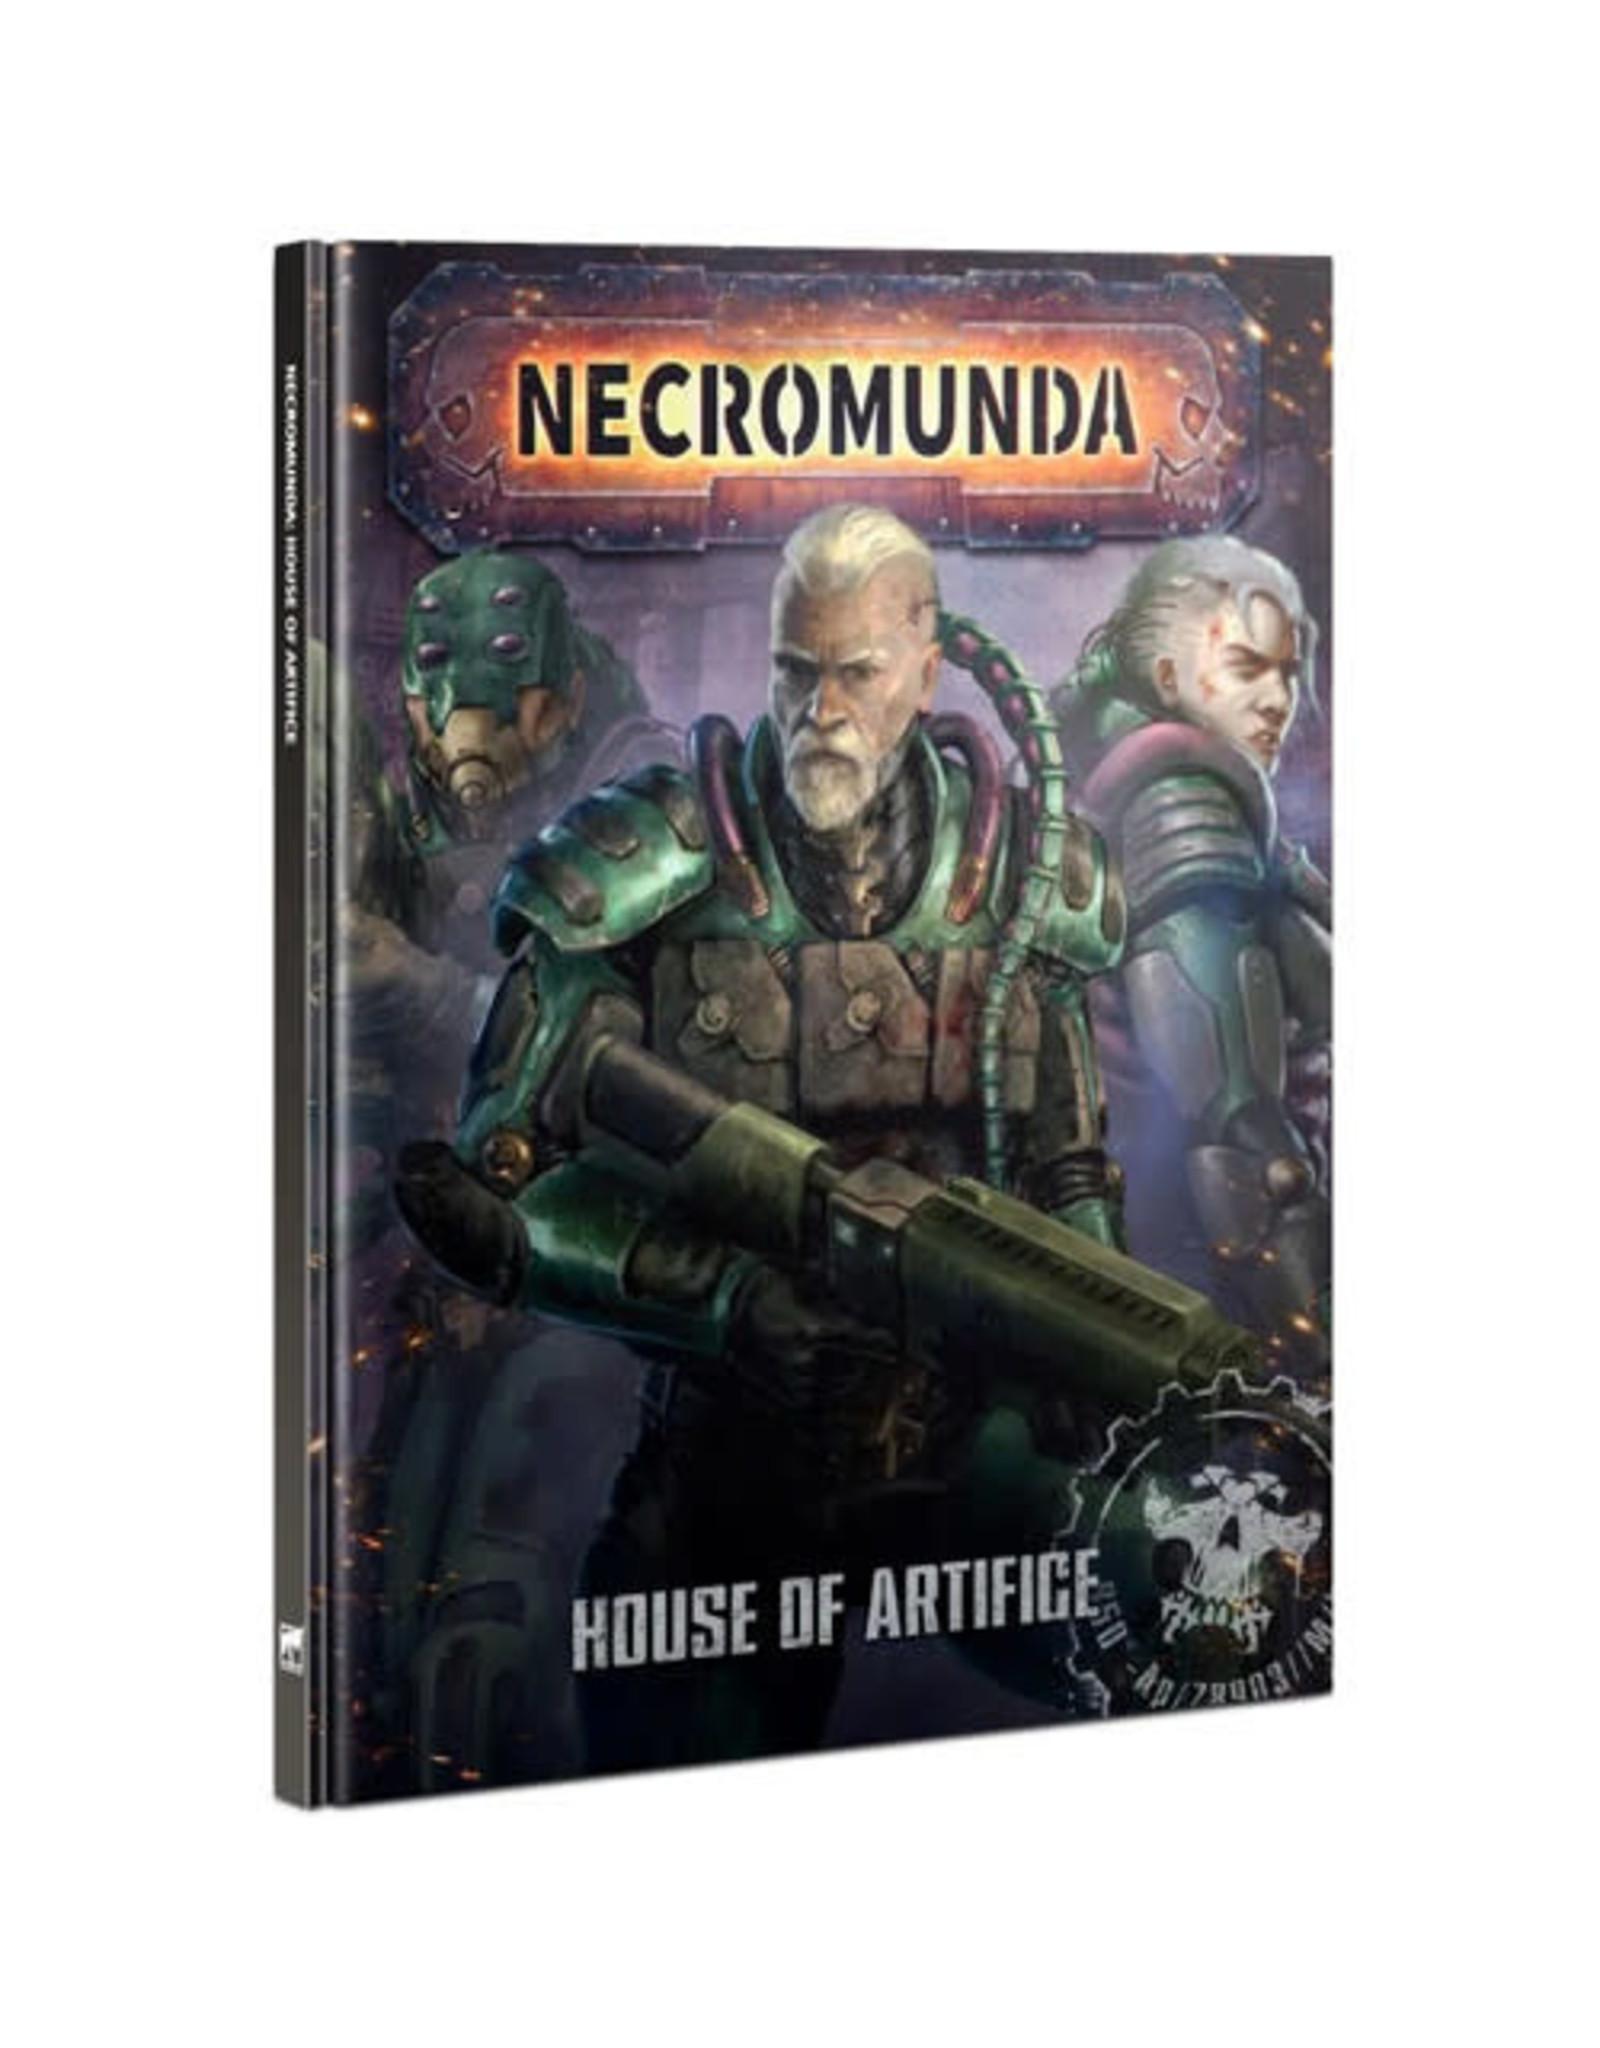 Necromunda House of Artifice